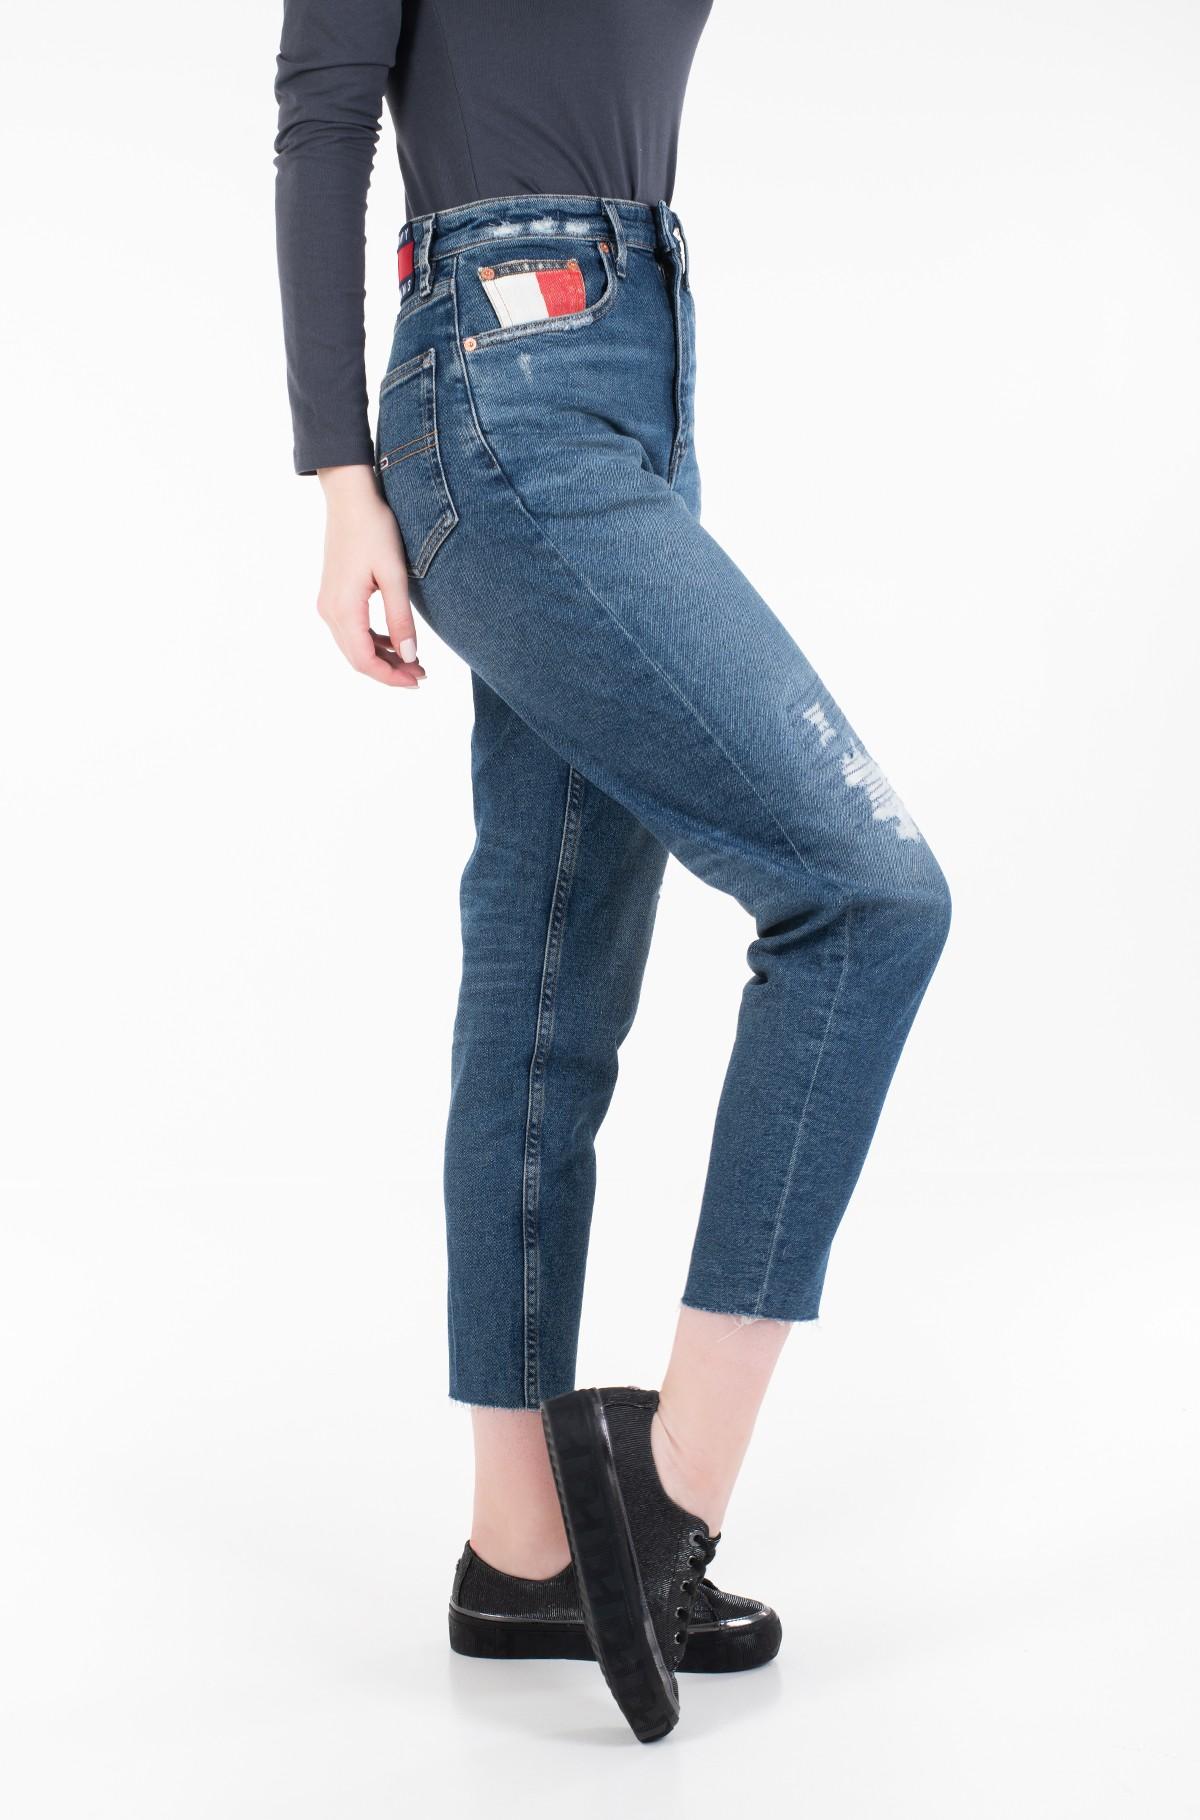 Jeans HIGH RISE TAPERED TJ 2004 BTSM-full-1